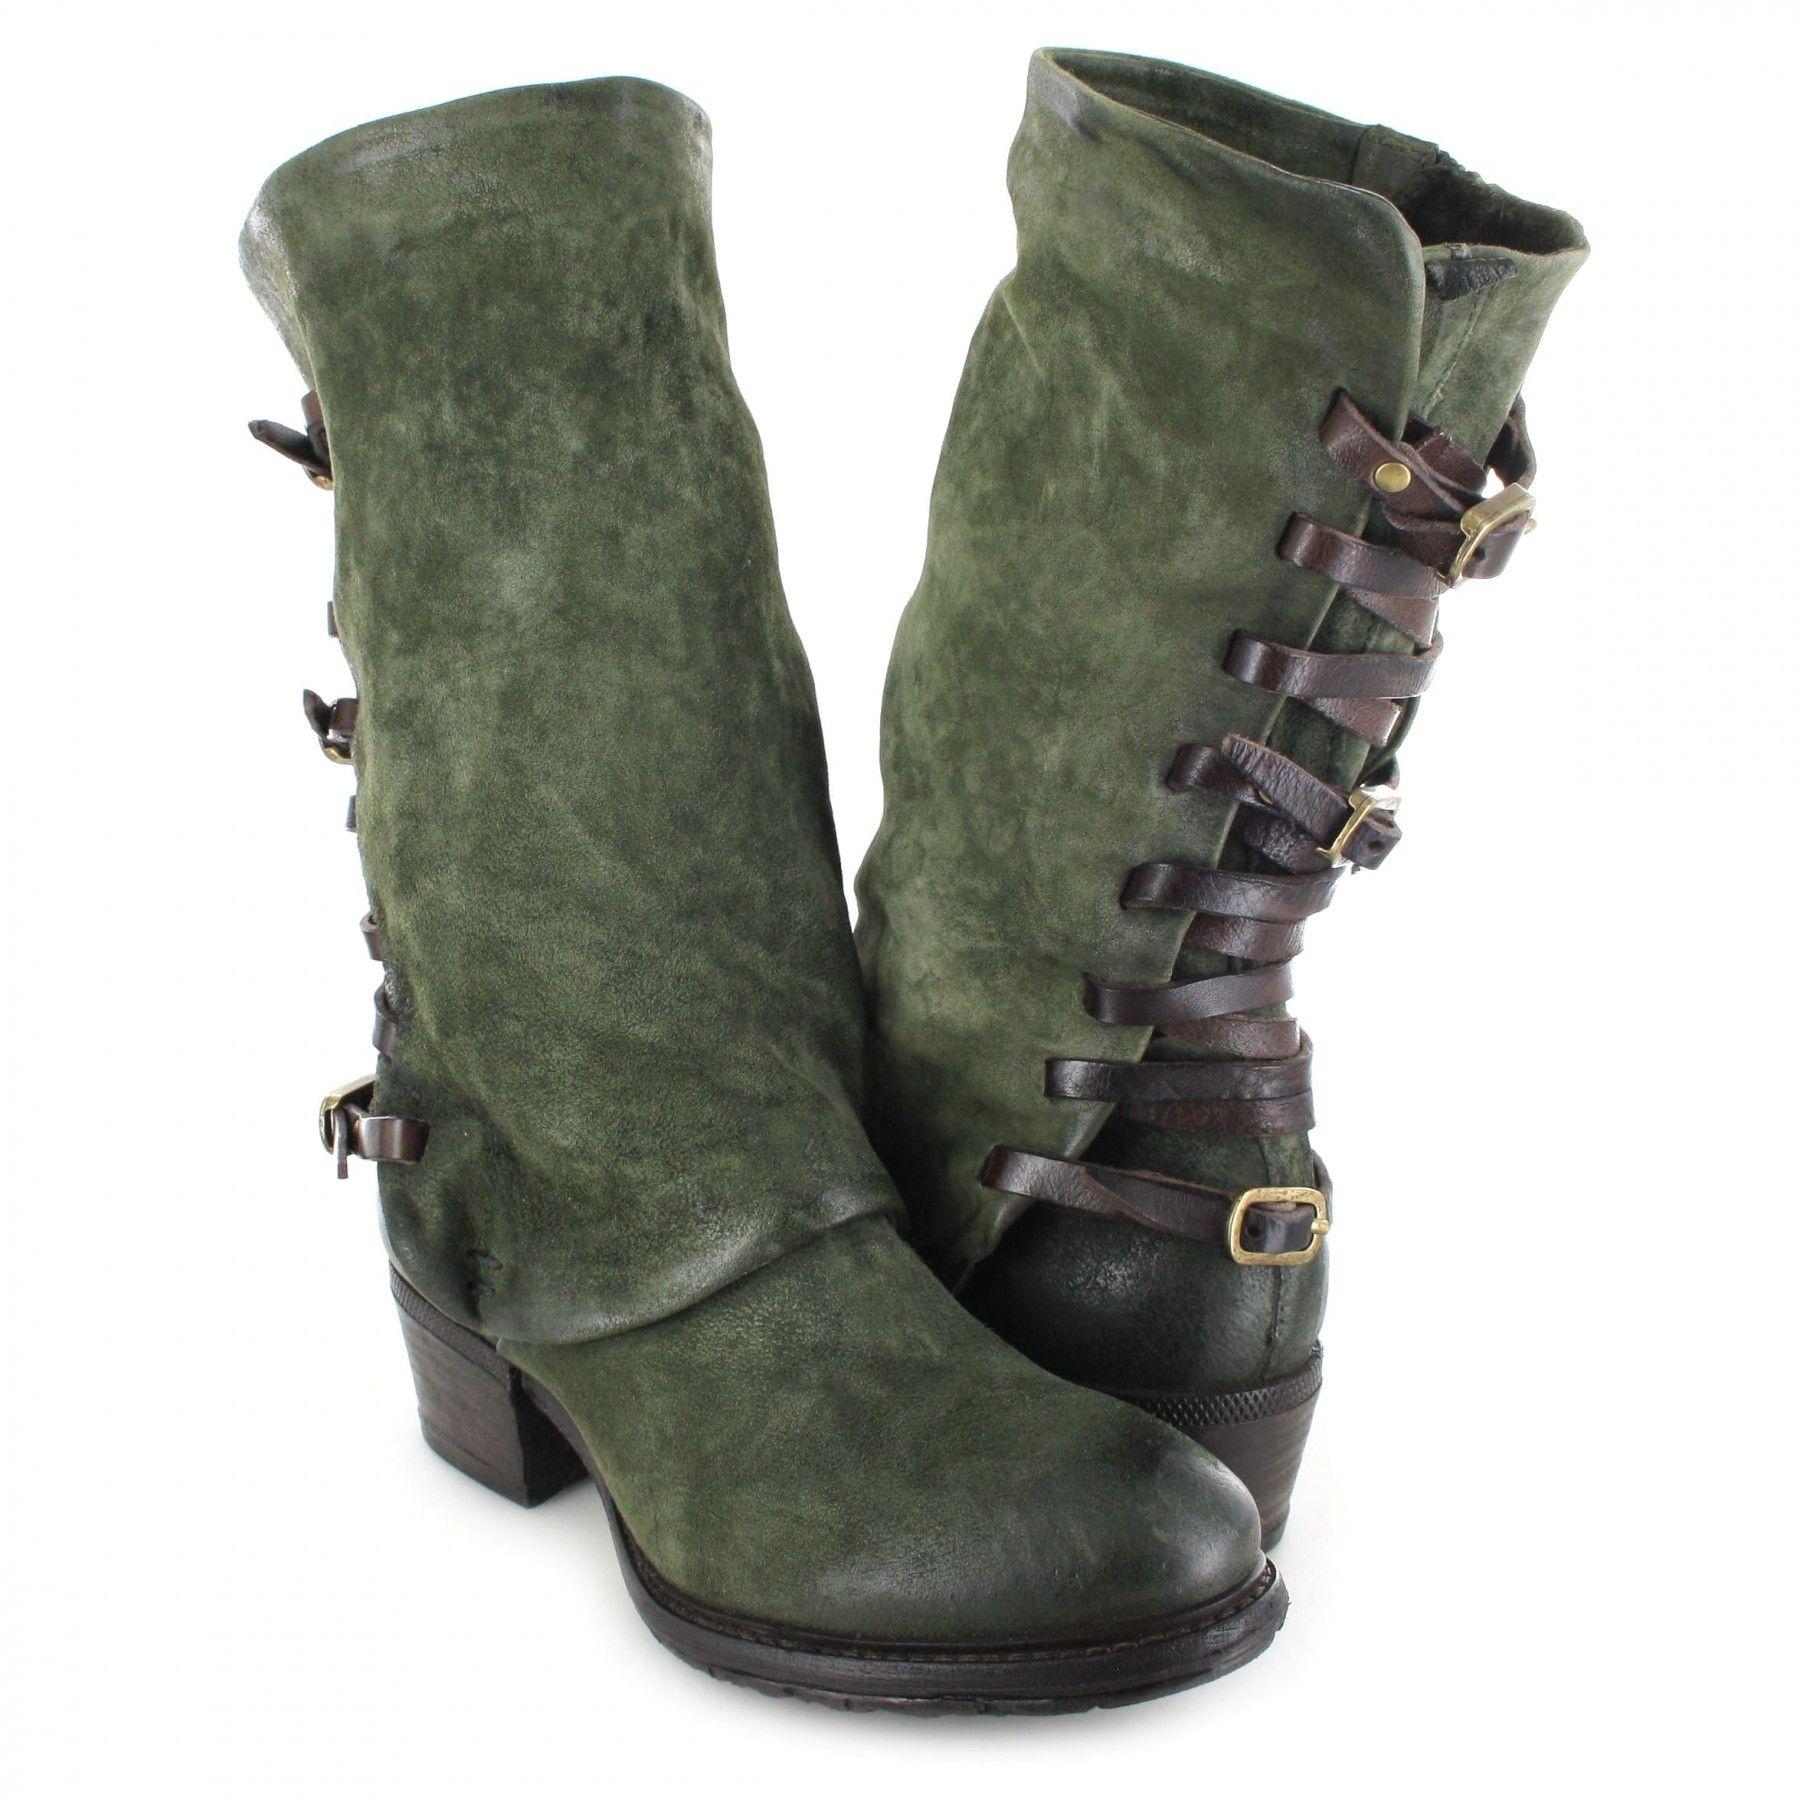 huge selection of e372c a0167 A.S.98 CORN17 260305 Jungle Fashion Stiefelette - grün ...